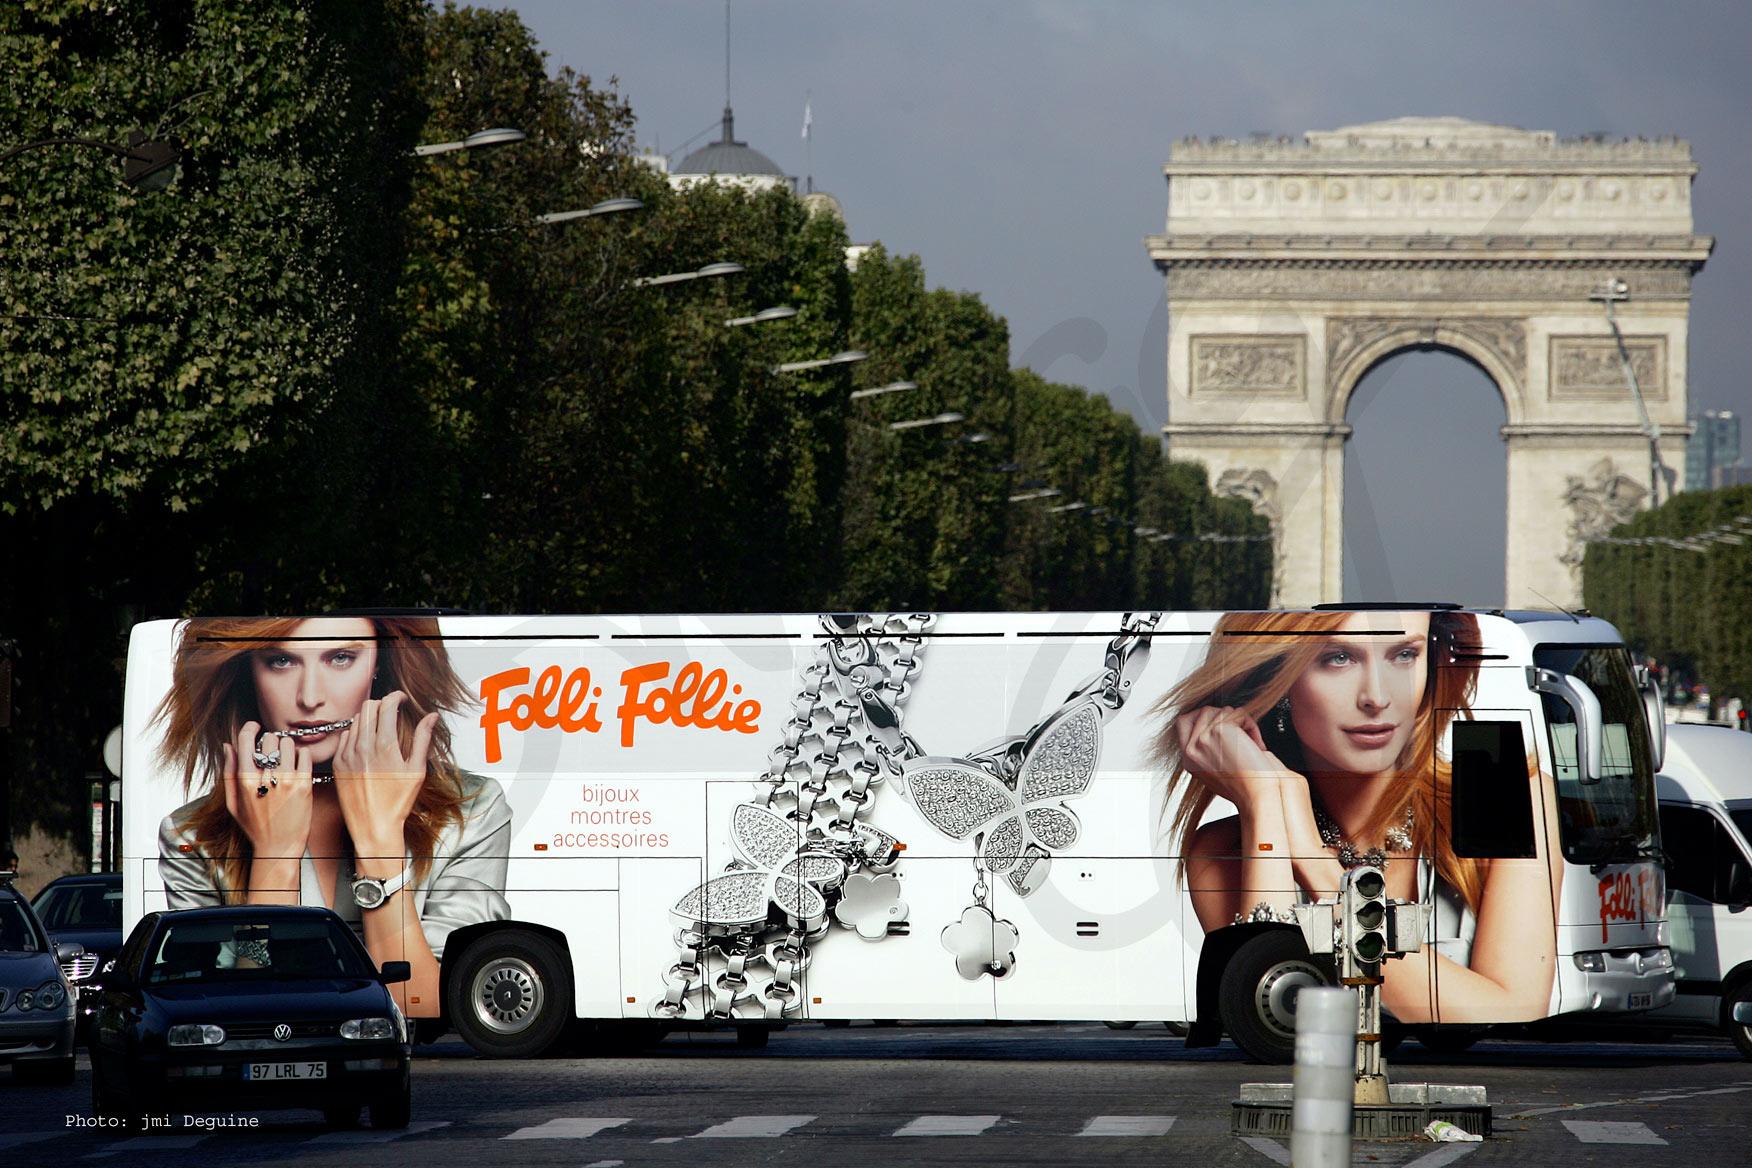 Campagne Folli Follie